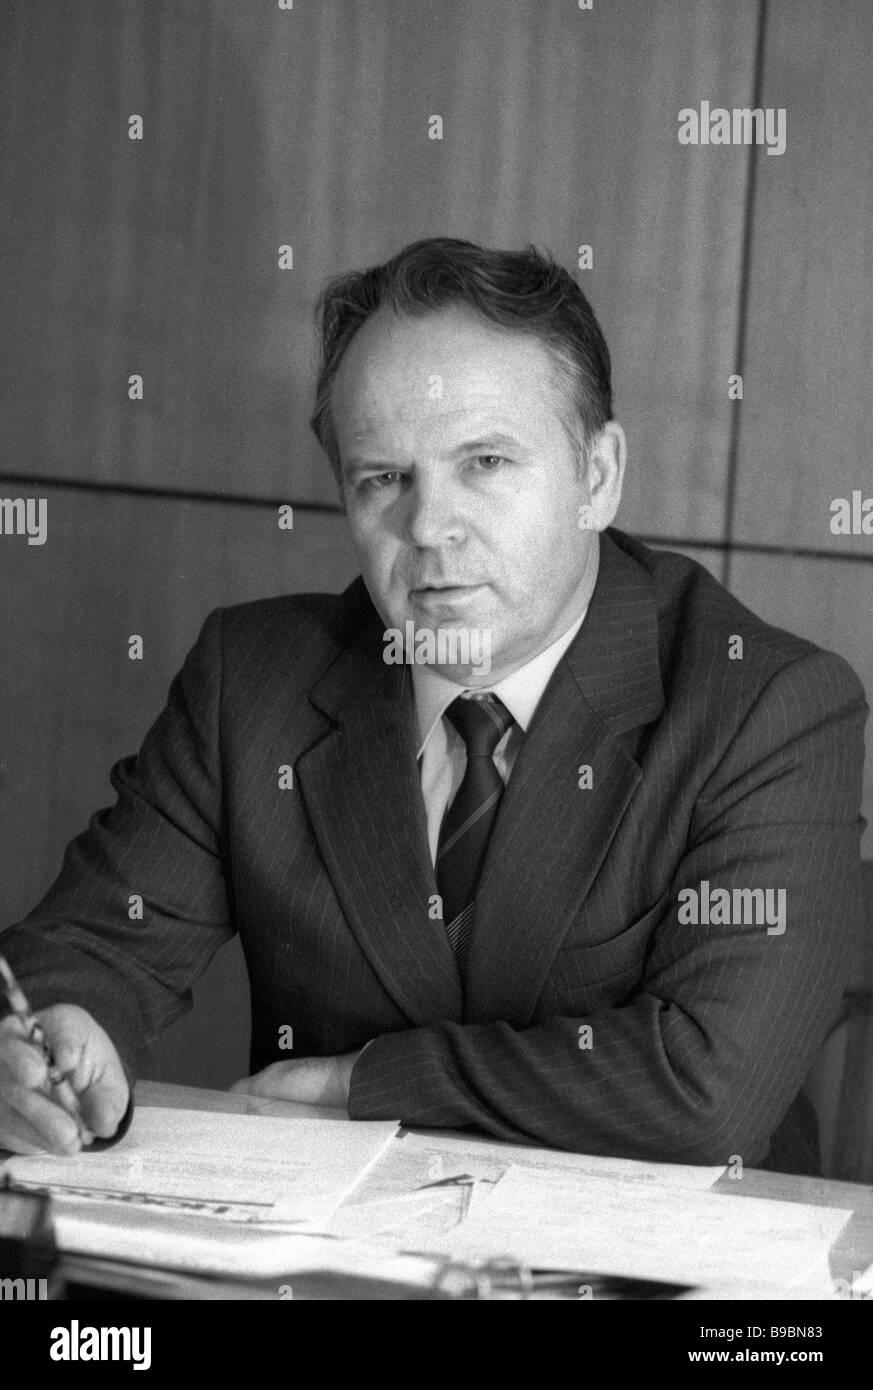 Vladimir Desyatirik CEO of the Mosfilm studio Stock Photo